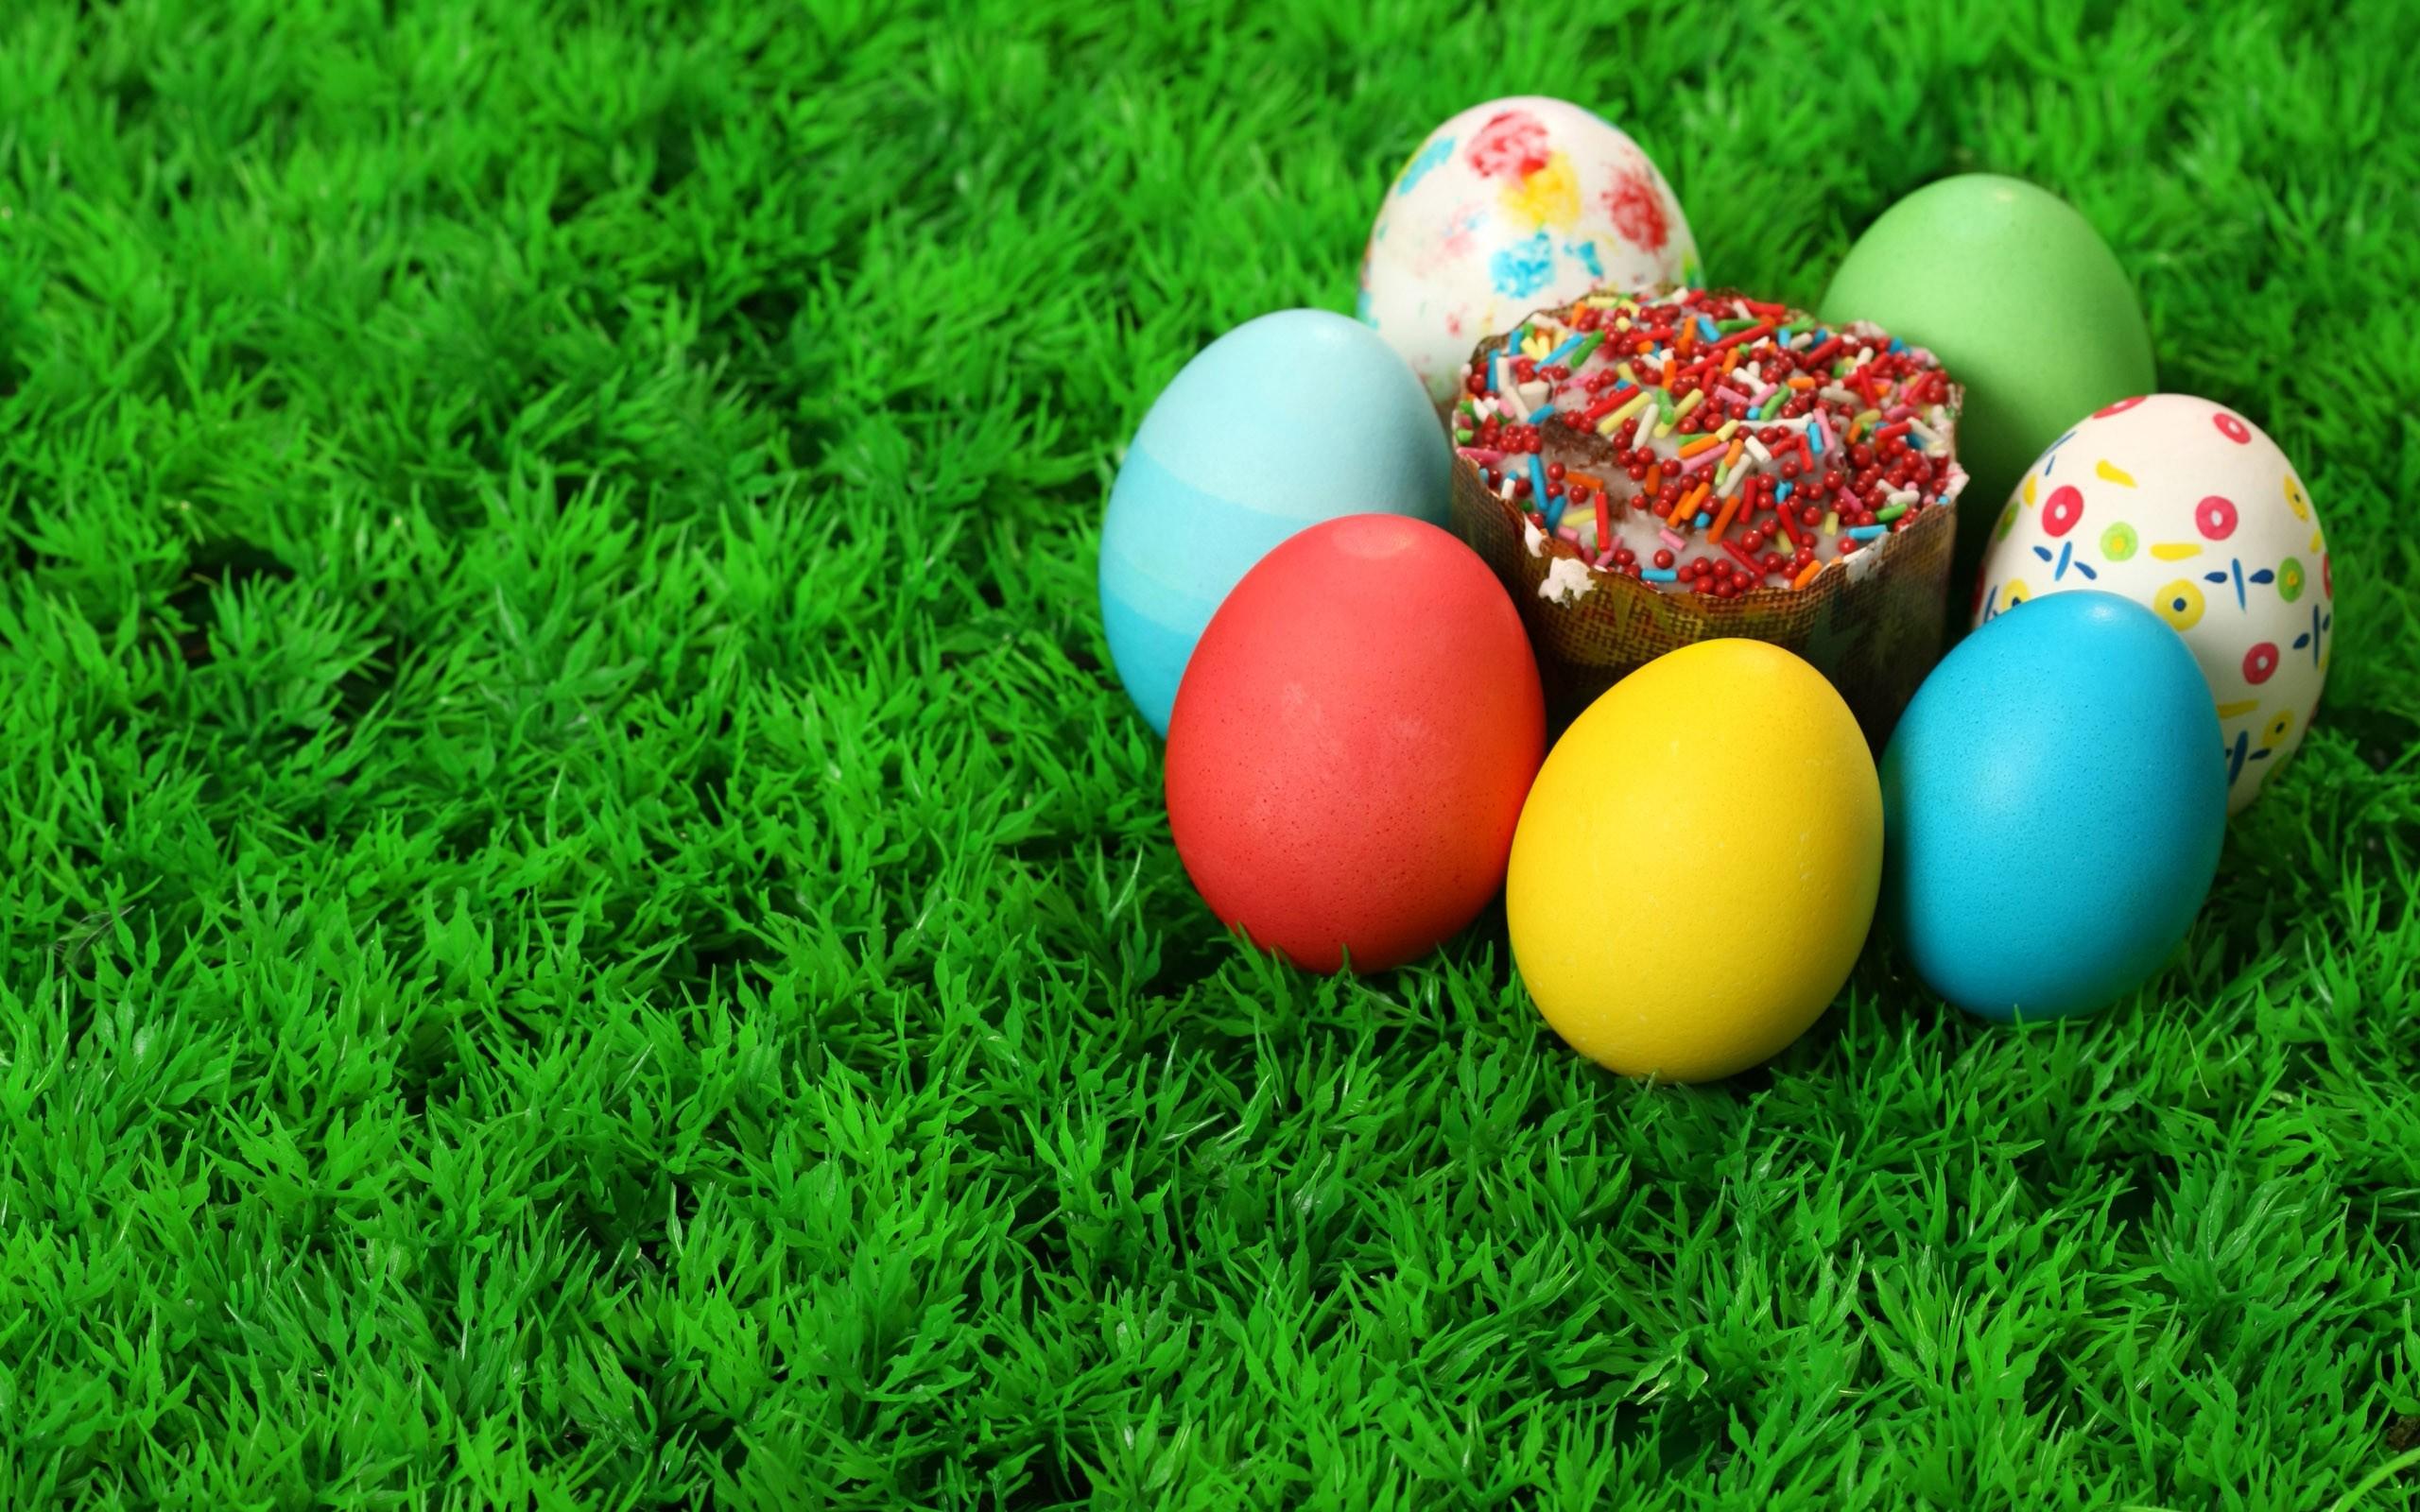 Download the Easter Egg Cupcake Wallpaper Easter Egg 2560x1600